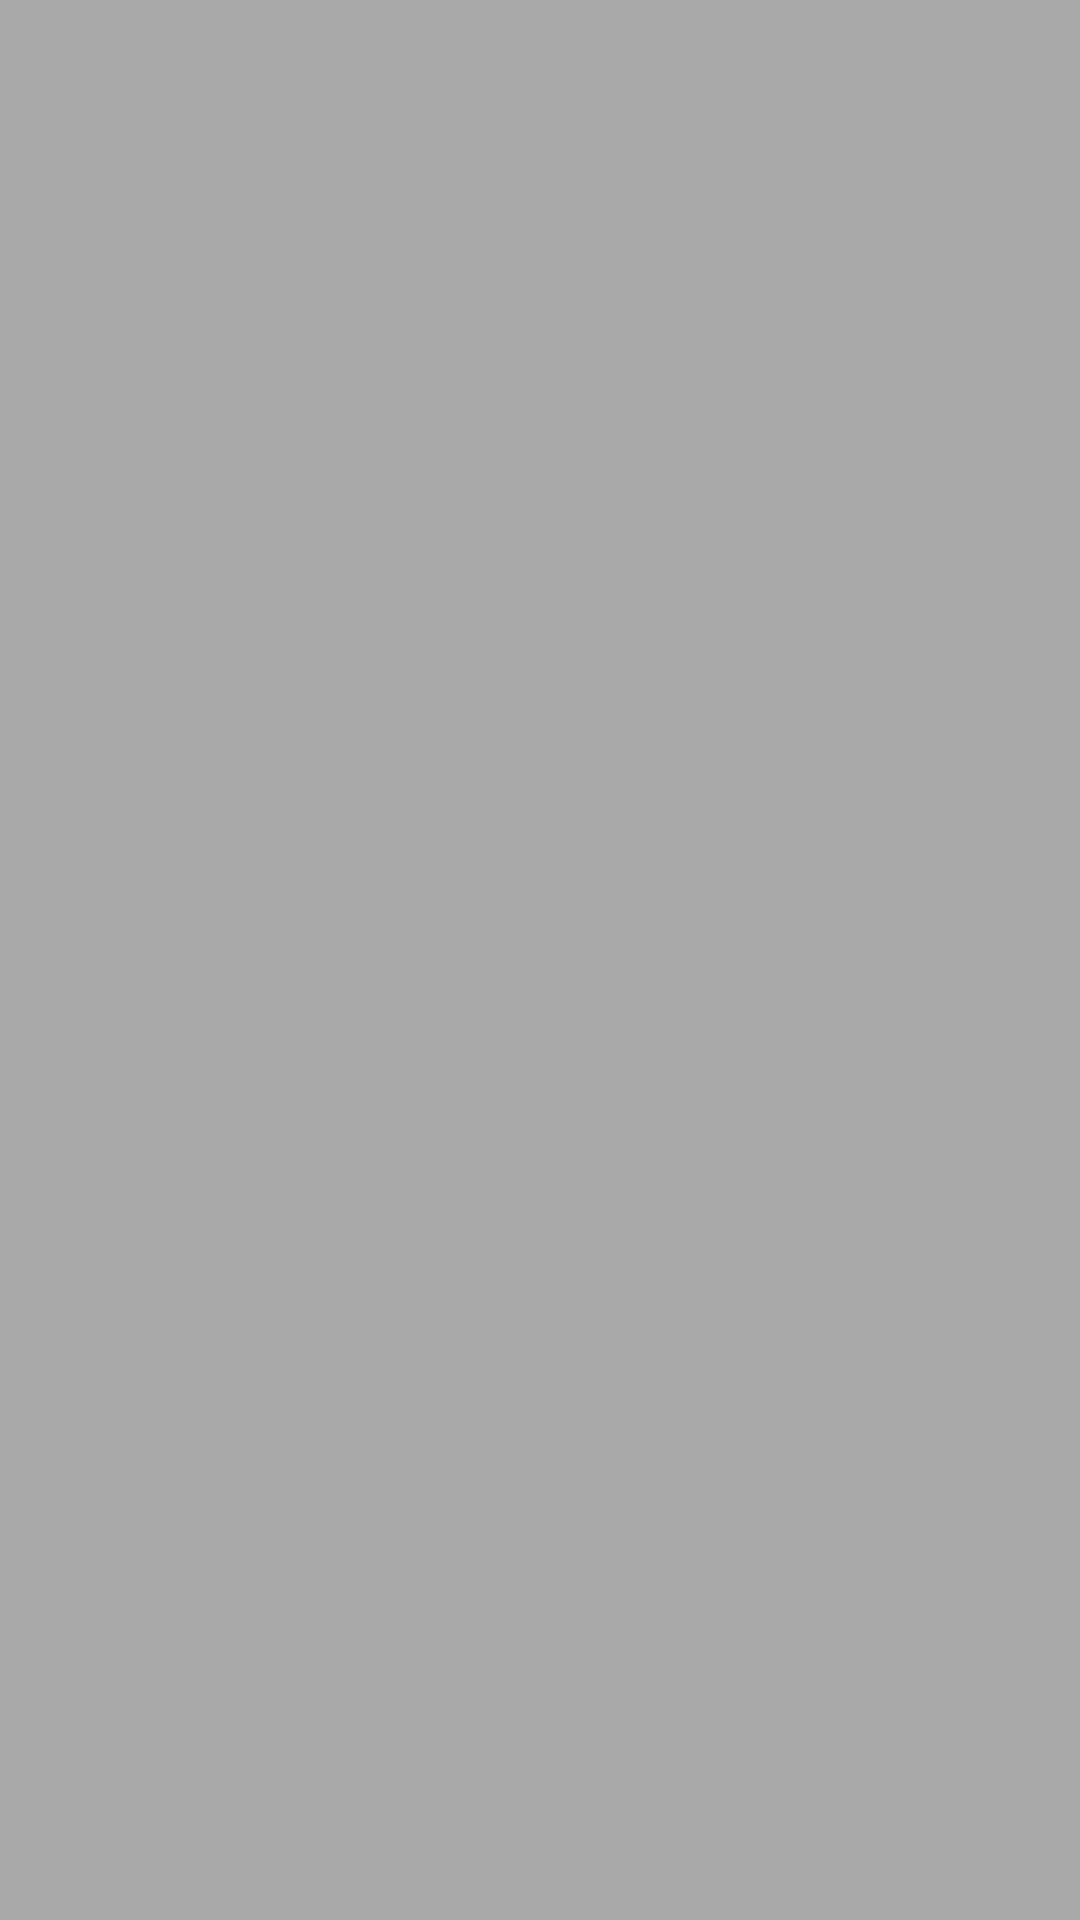 Free Download Dark Grey Iphone 5 6 Wallpaper Ipod Wallpaper 1080x1920 For Your Desktop Mobile Tablet Explore 47 Solid Dark Grey Wallpaper Solid Wallpaper For Walls Solid Color Wallpaper